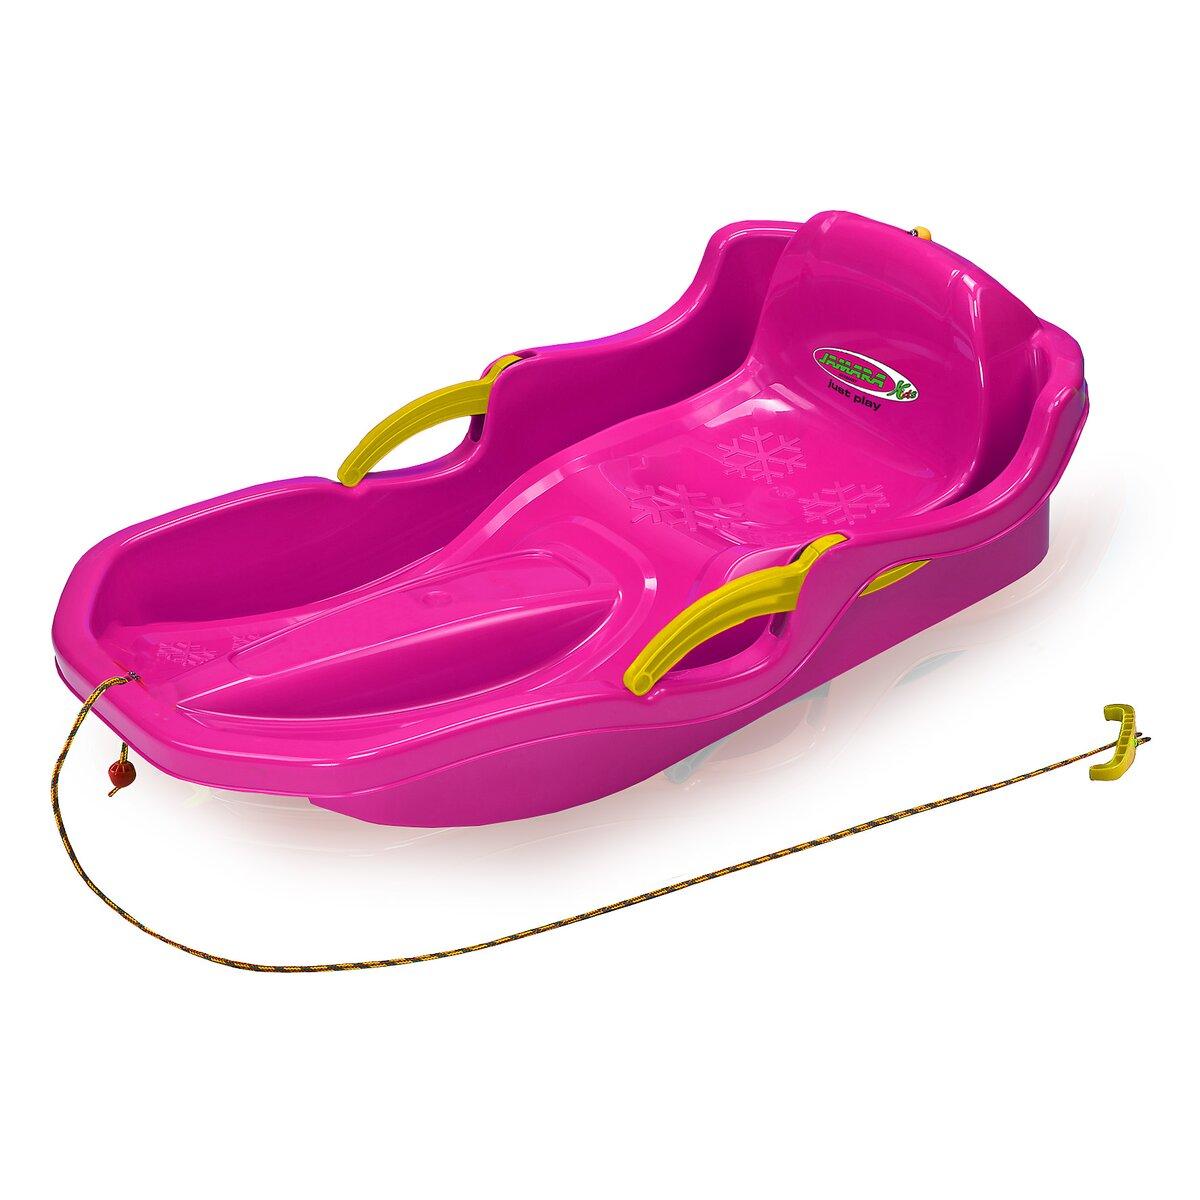 Snow Play Bob Comfort 80 cm pink mit Bremse